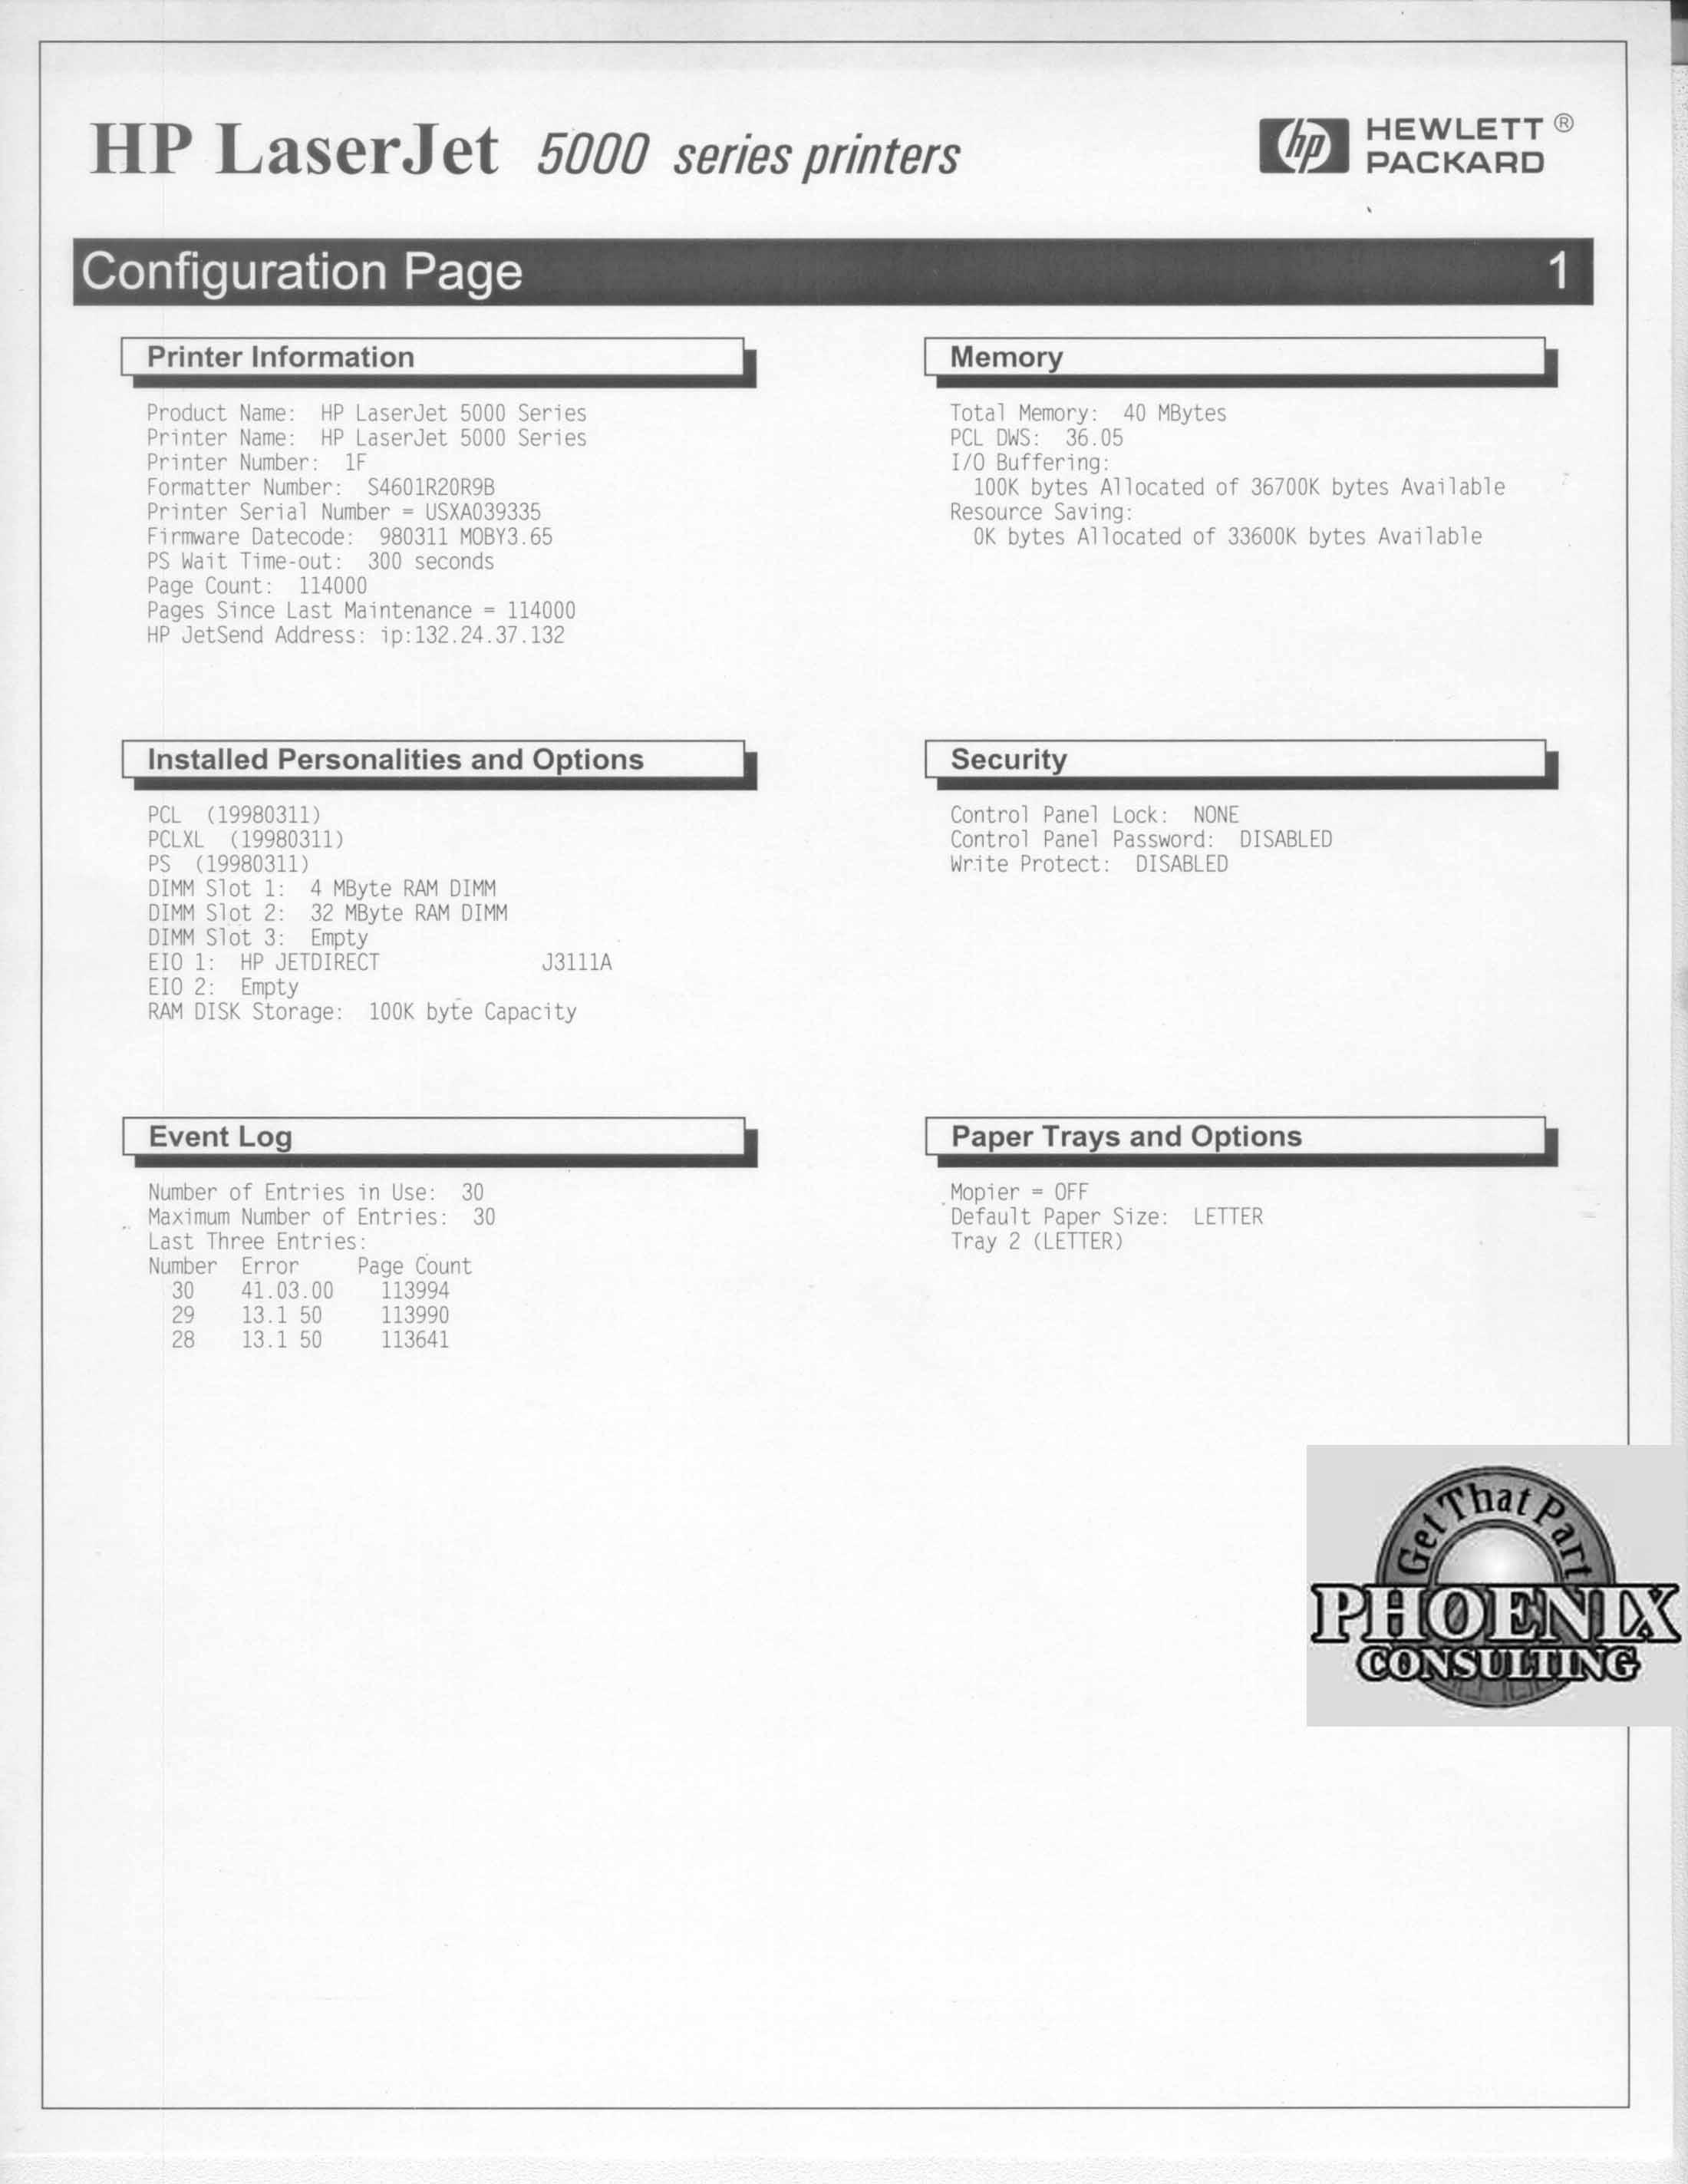 HP LaserJet 5000 5000N C4112A TABLOID NETWORK PRINTER